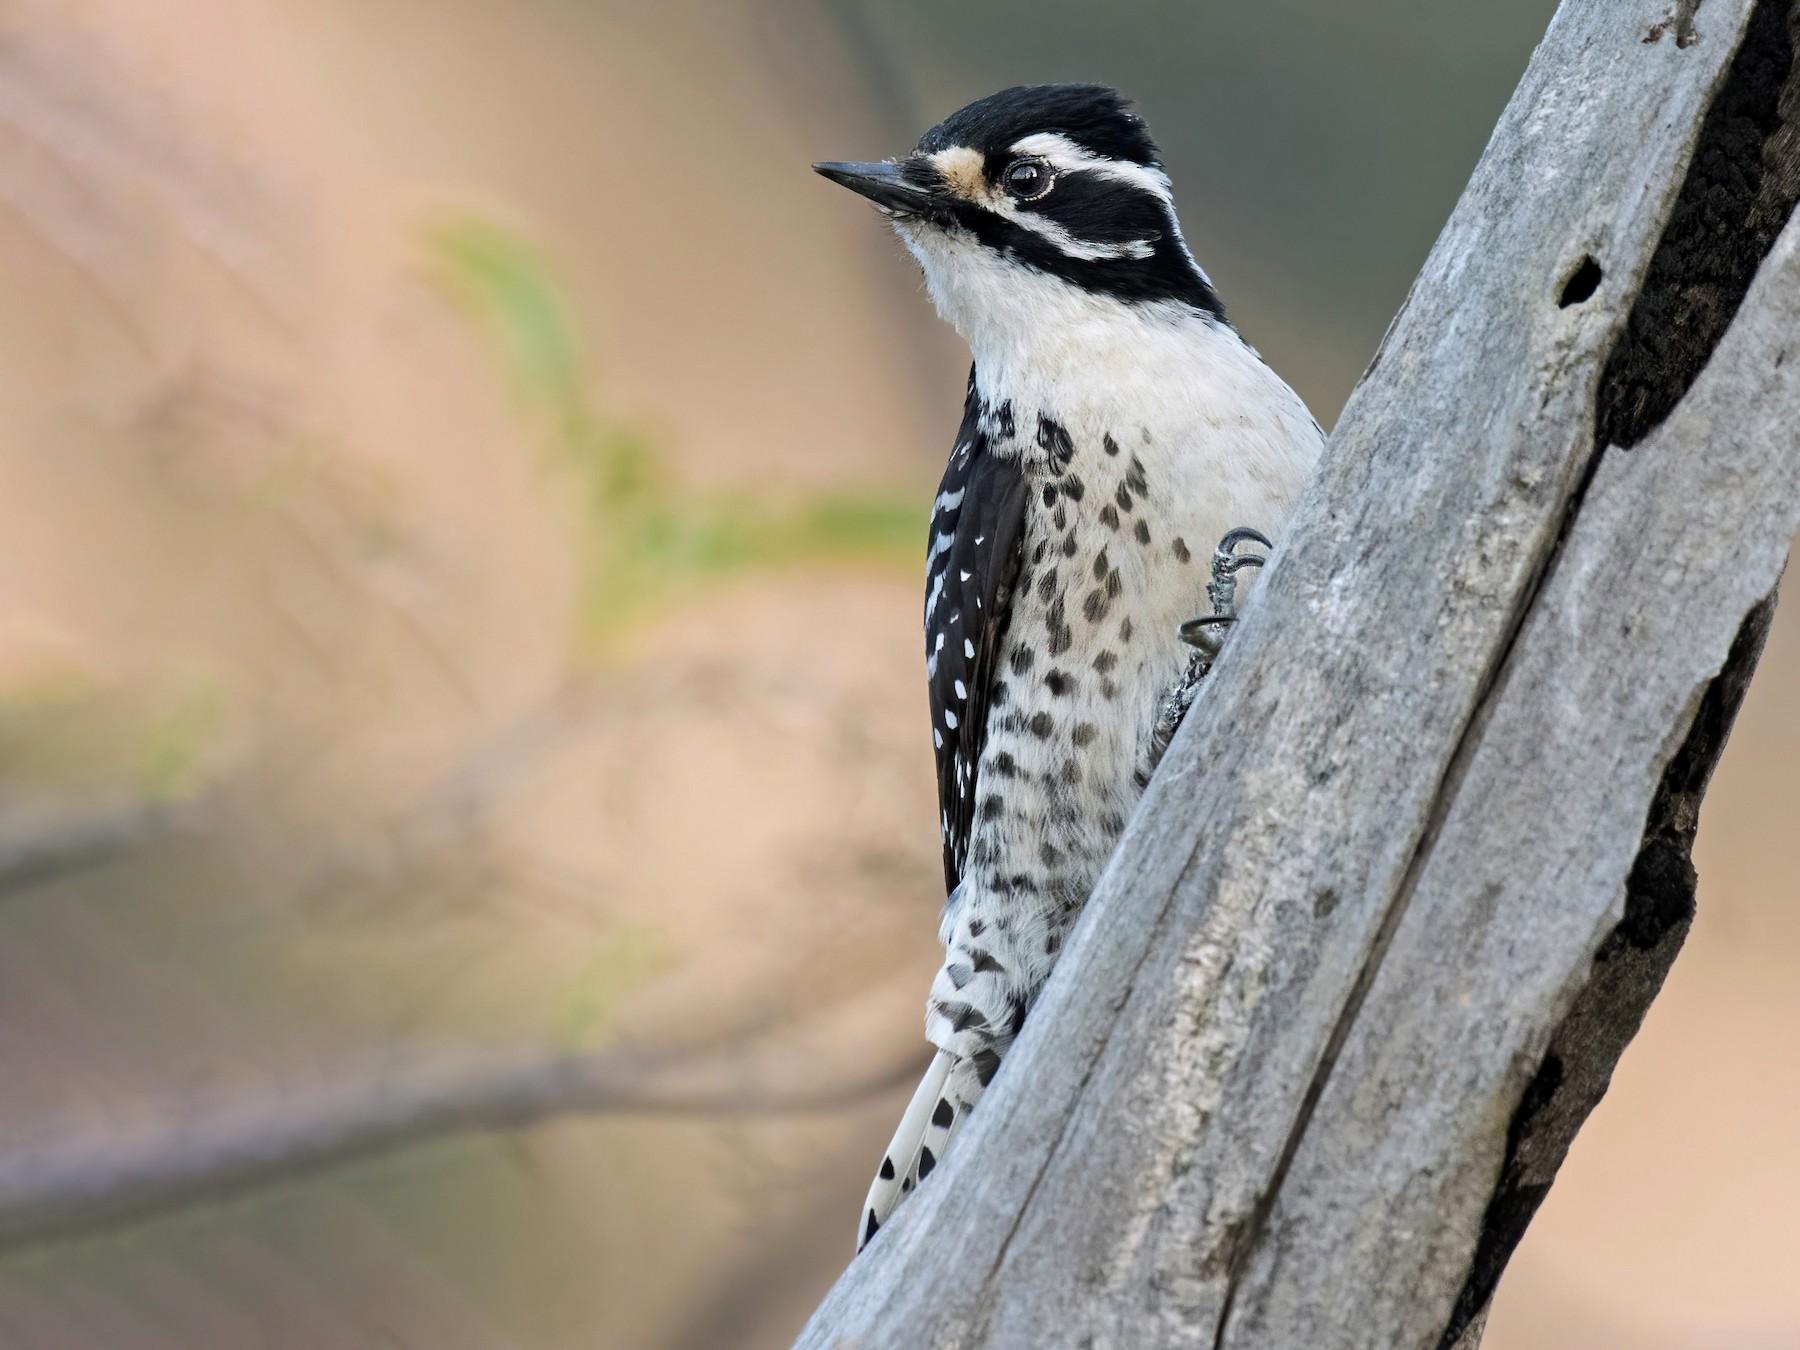 Nuttall's Woodpecker - Alison Davies